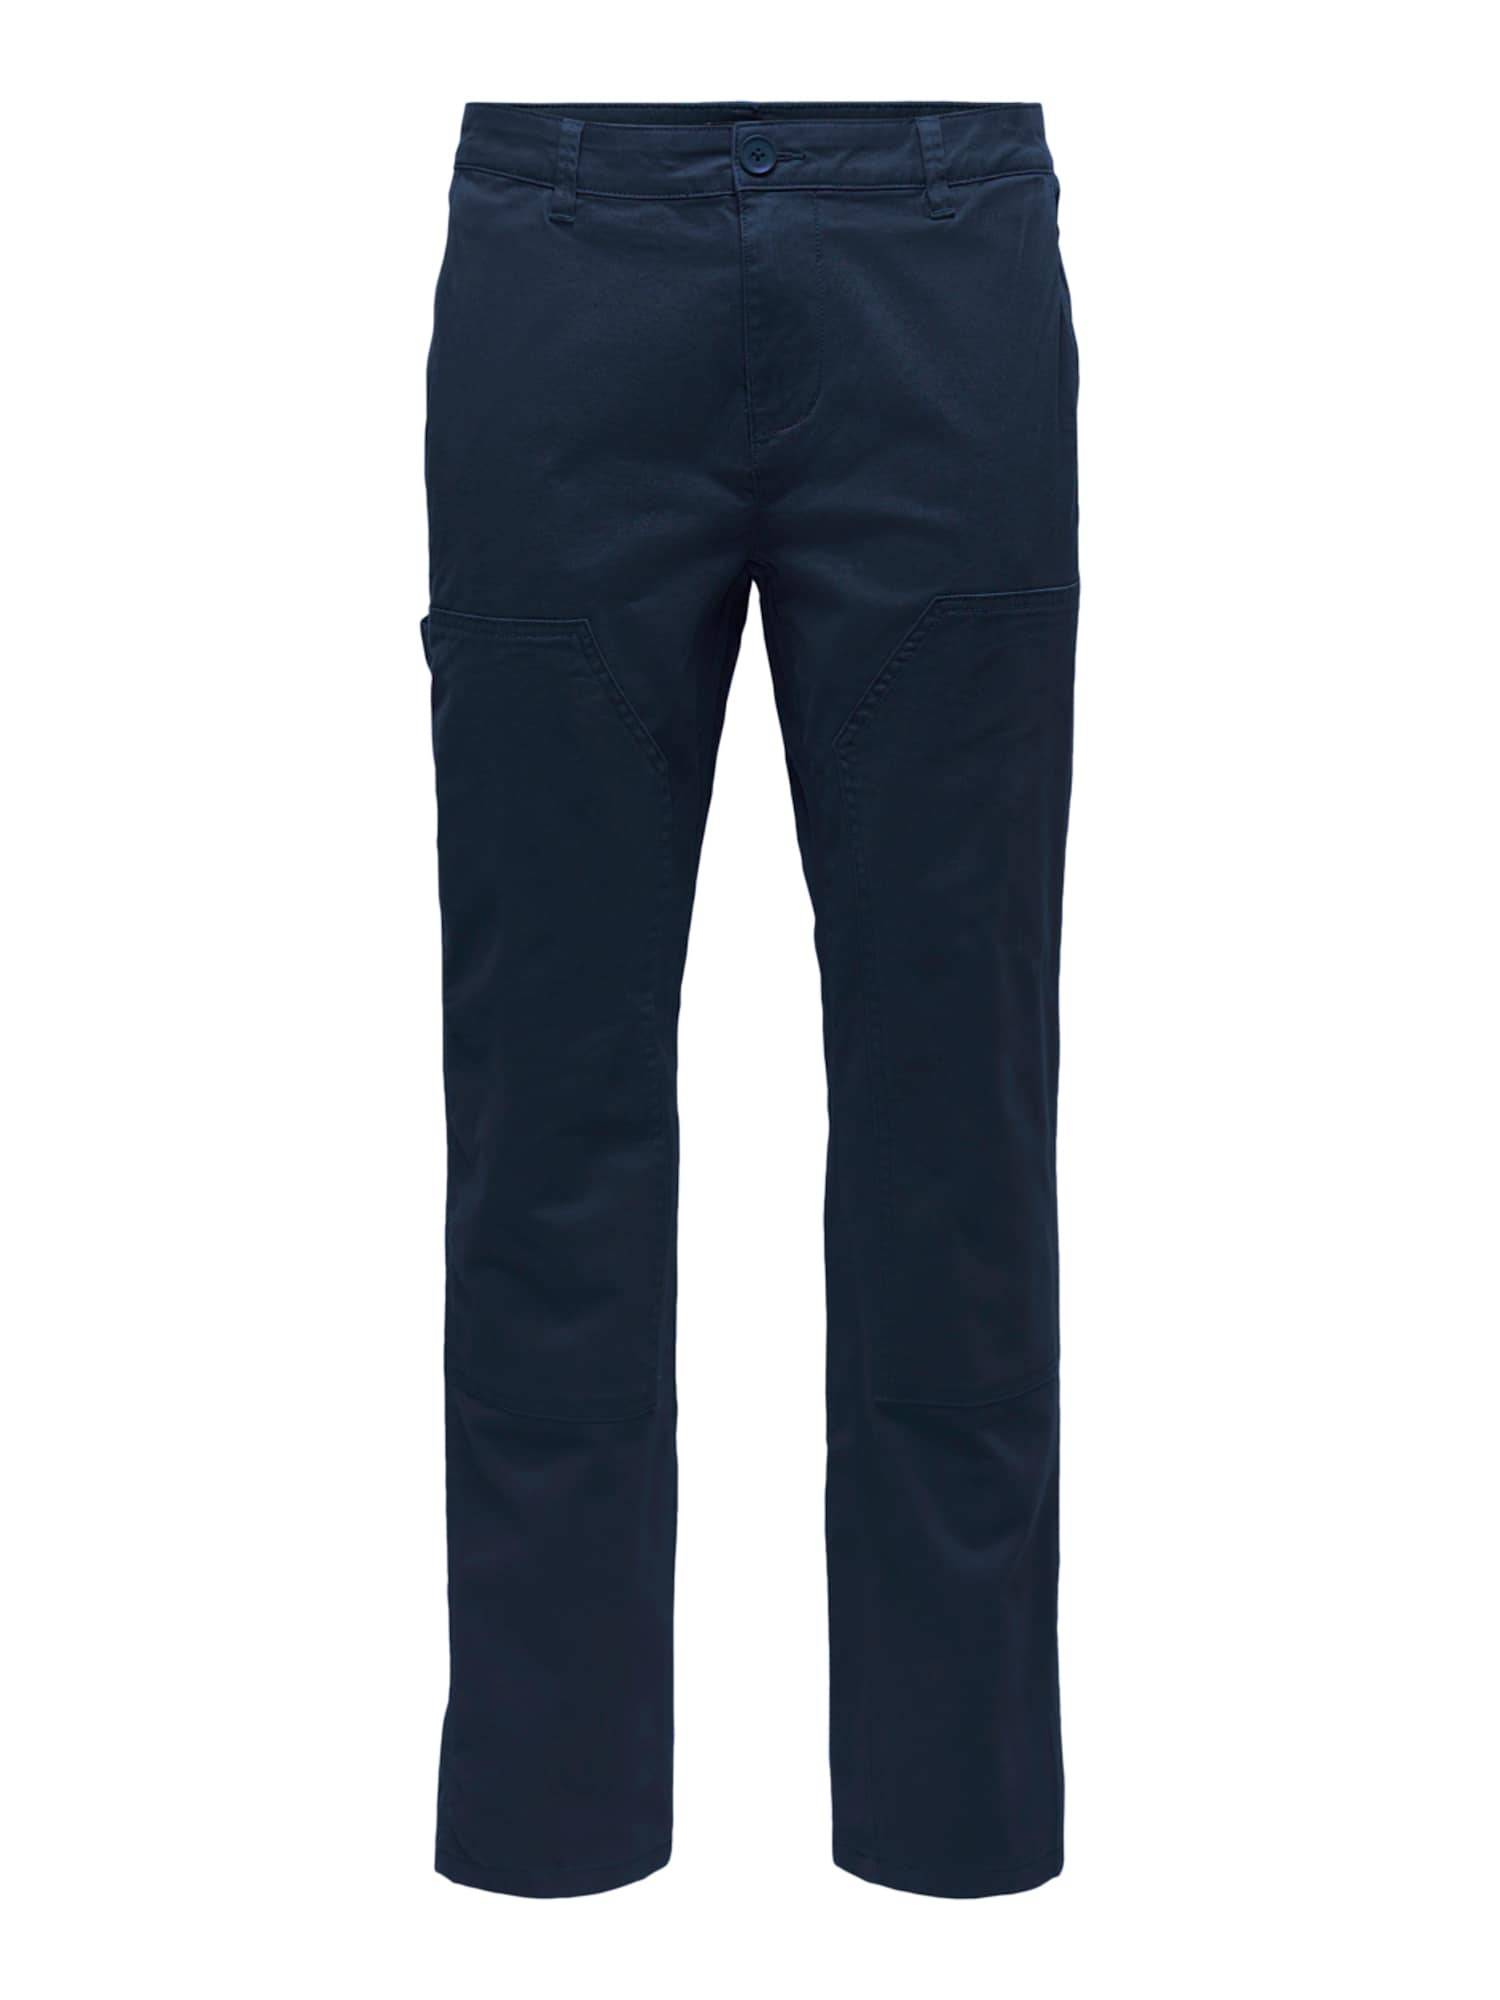 Only & Sons Pantalon 'Cam'  - Bleu - Taille: 30 - male